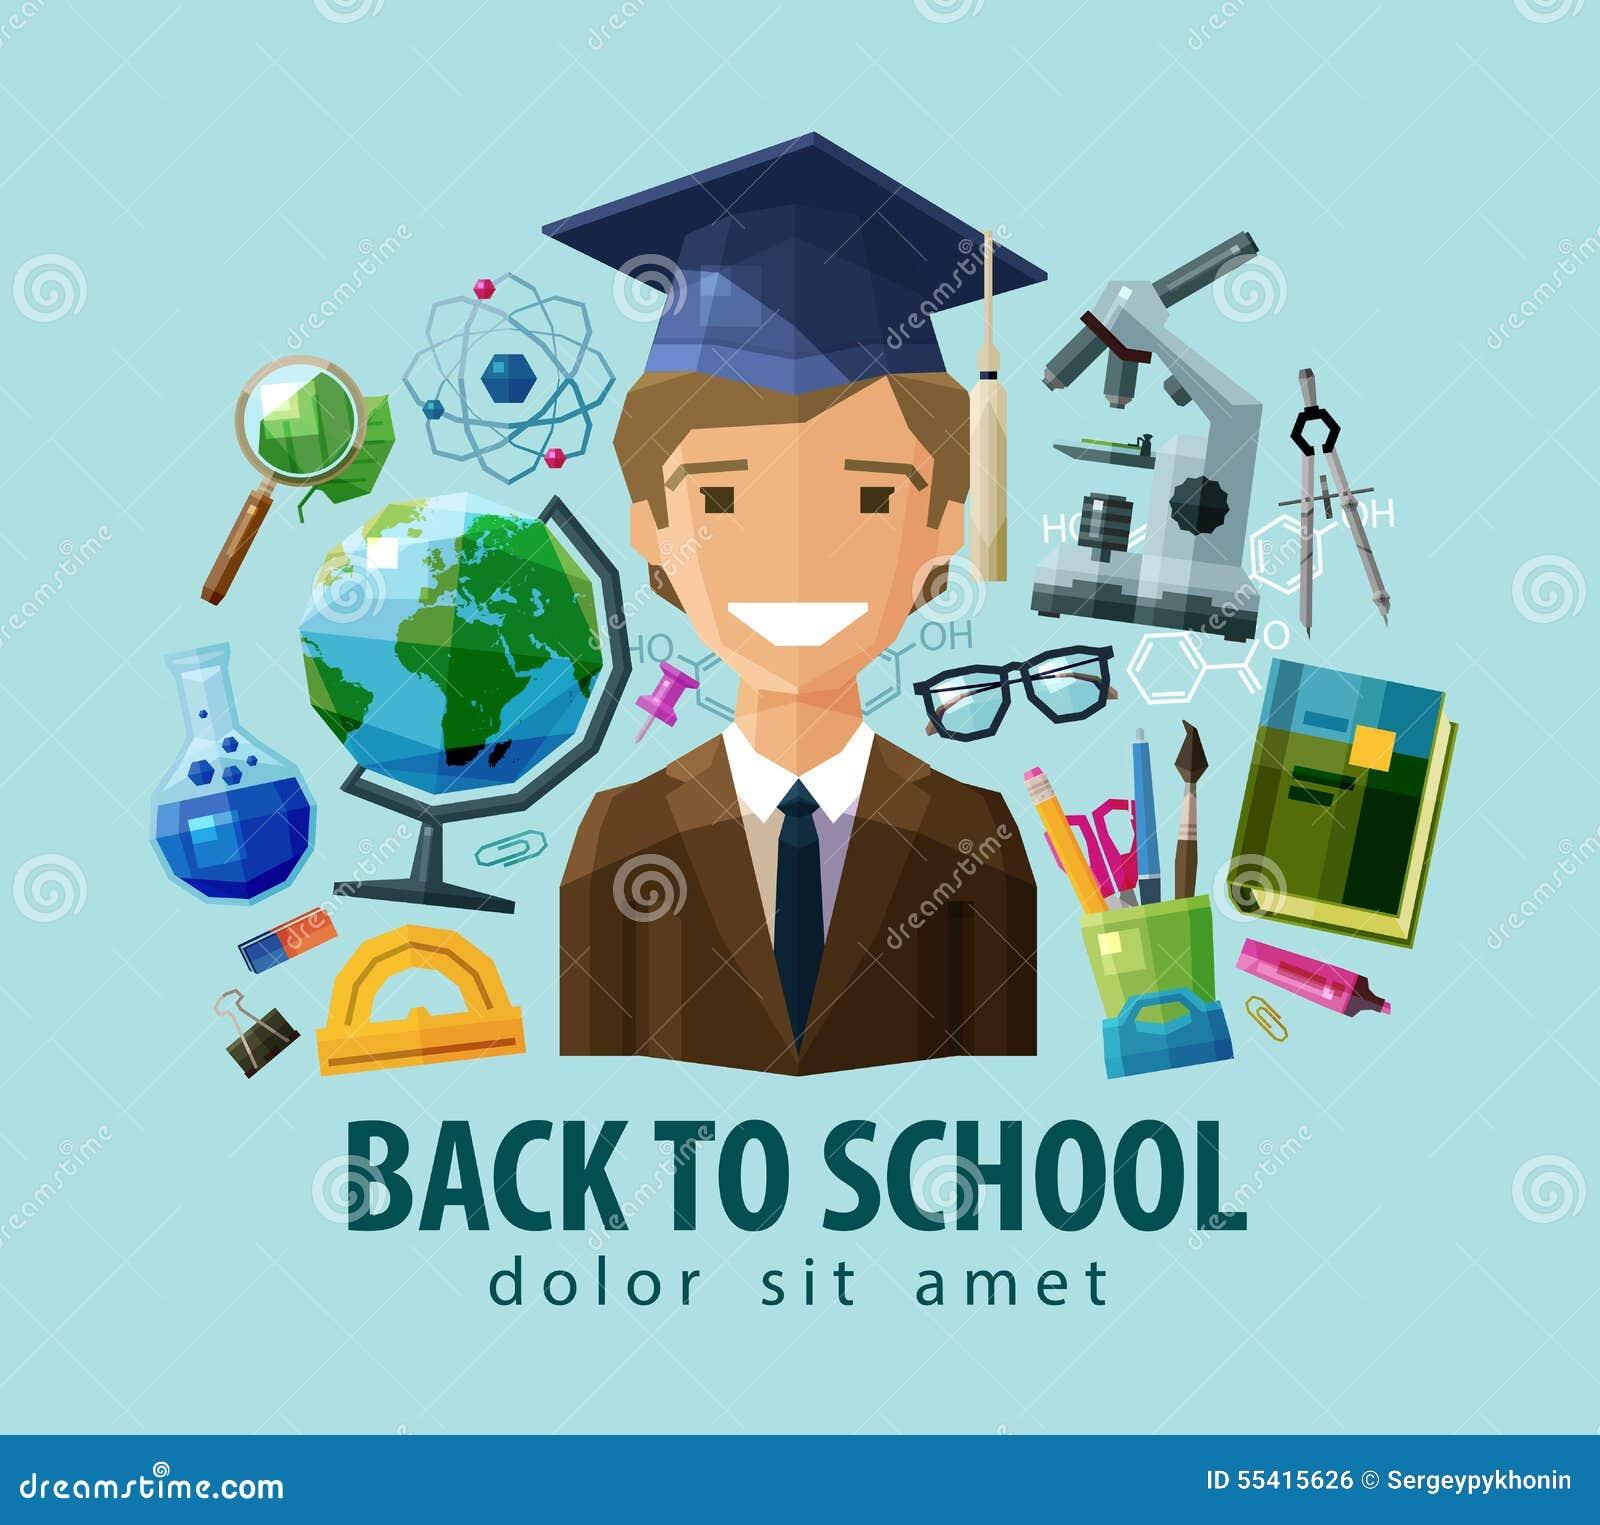 Schools Education6 25 18students: Back To School Vector Logo Design Template Stock Vector